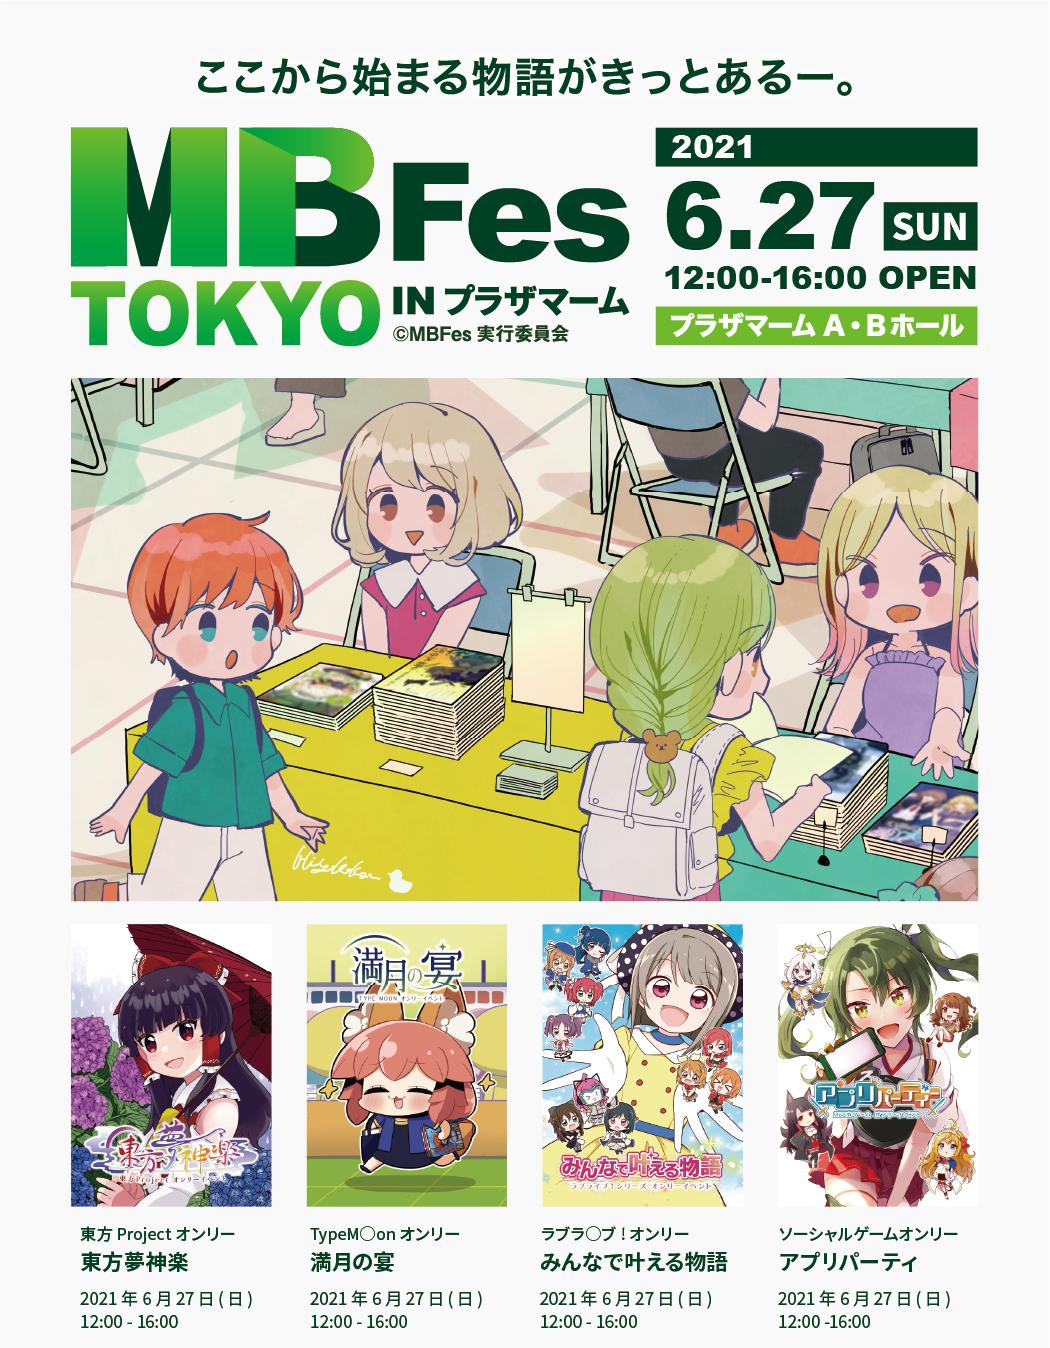 MBFes TOKYO inプラザマーム